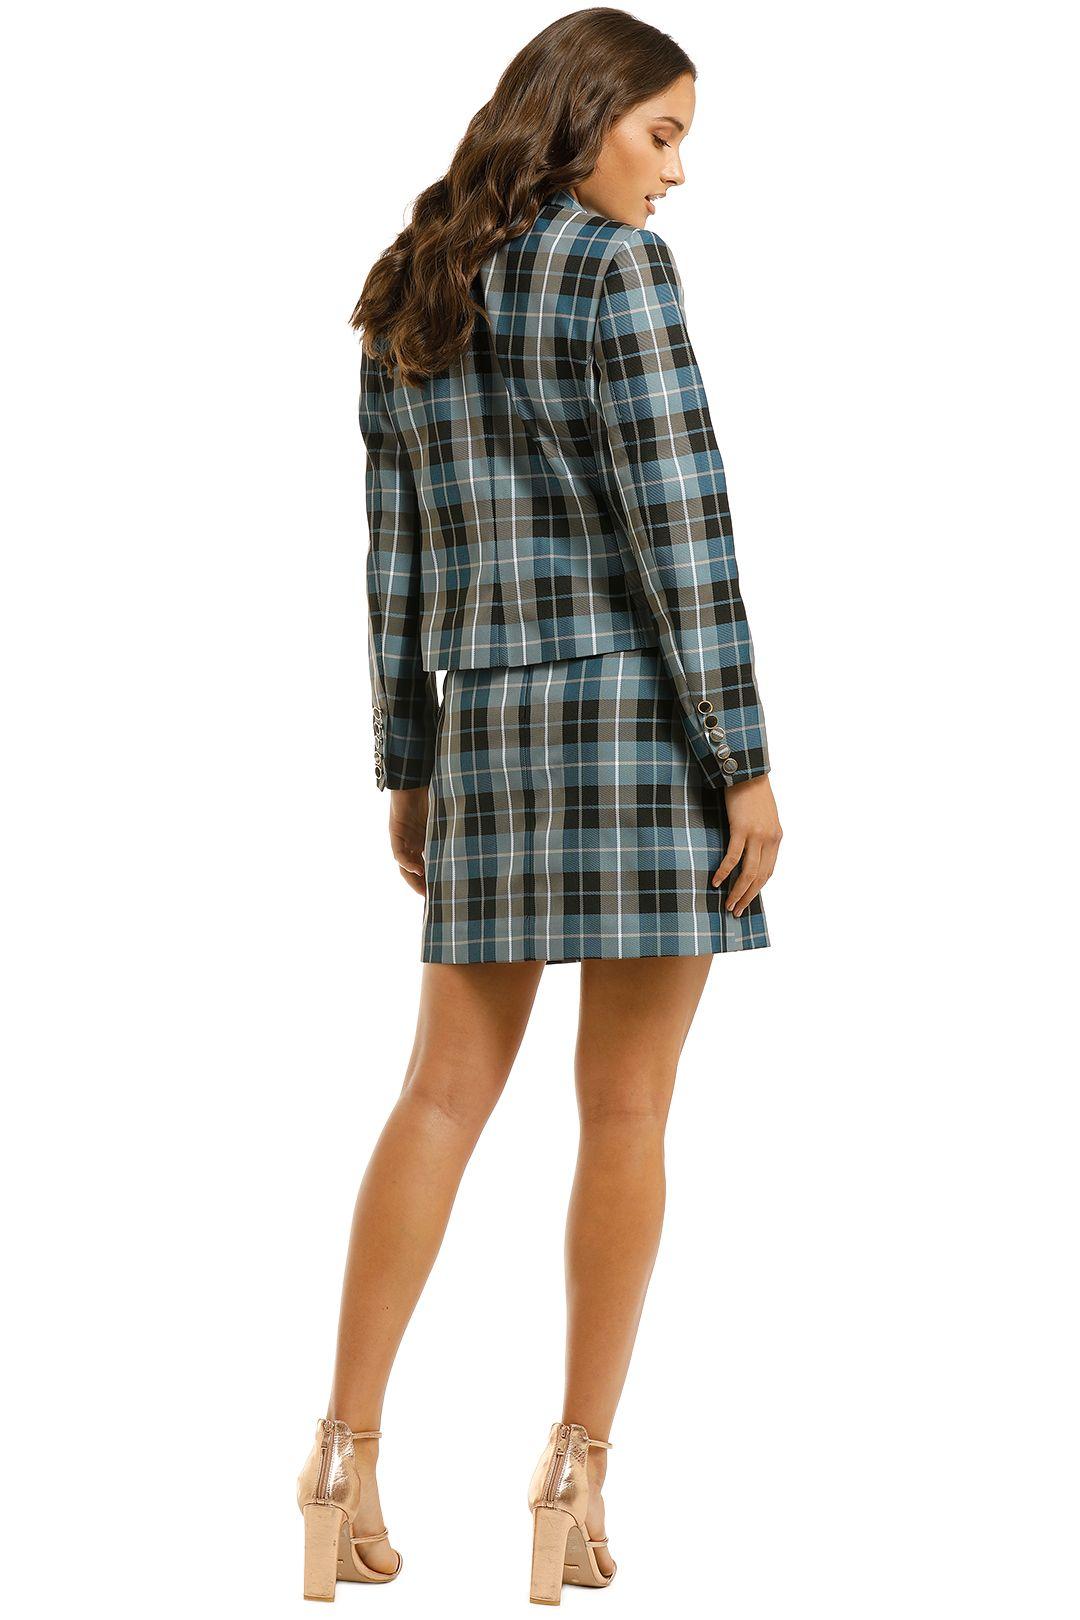 Country-Road-Crop-Check-Blazer-and-Mini-Skirt-Set-Powder-Blue-Back